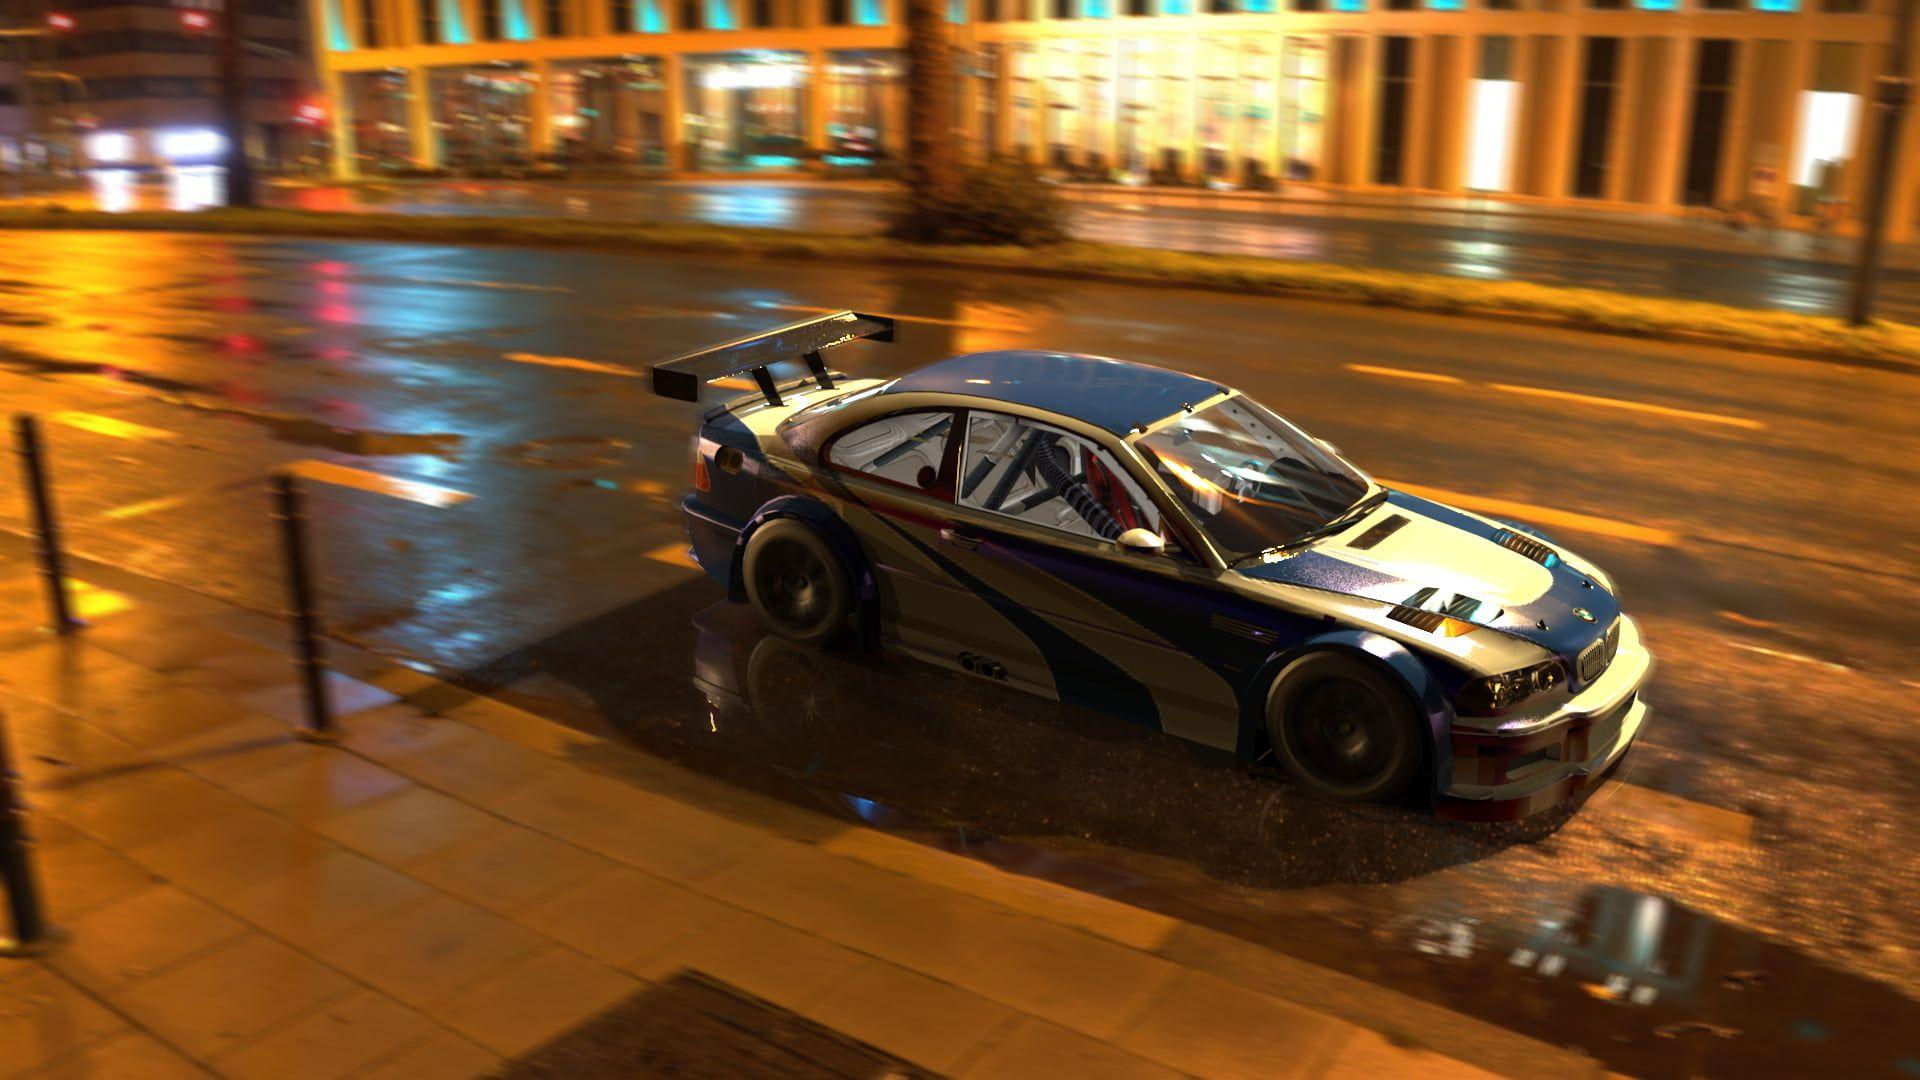 Bmw M3 Gtr Need For Speed Most Wanted Games Art Car 1080p Wallpaper Hdwallpaper Desktop M3 Gtr Bmw M3 Ford Mustang Gt